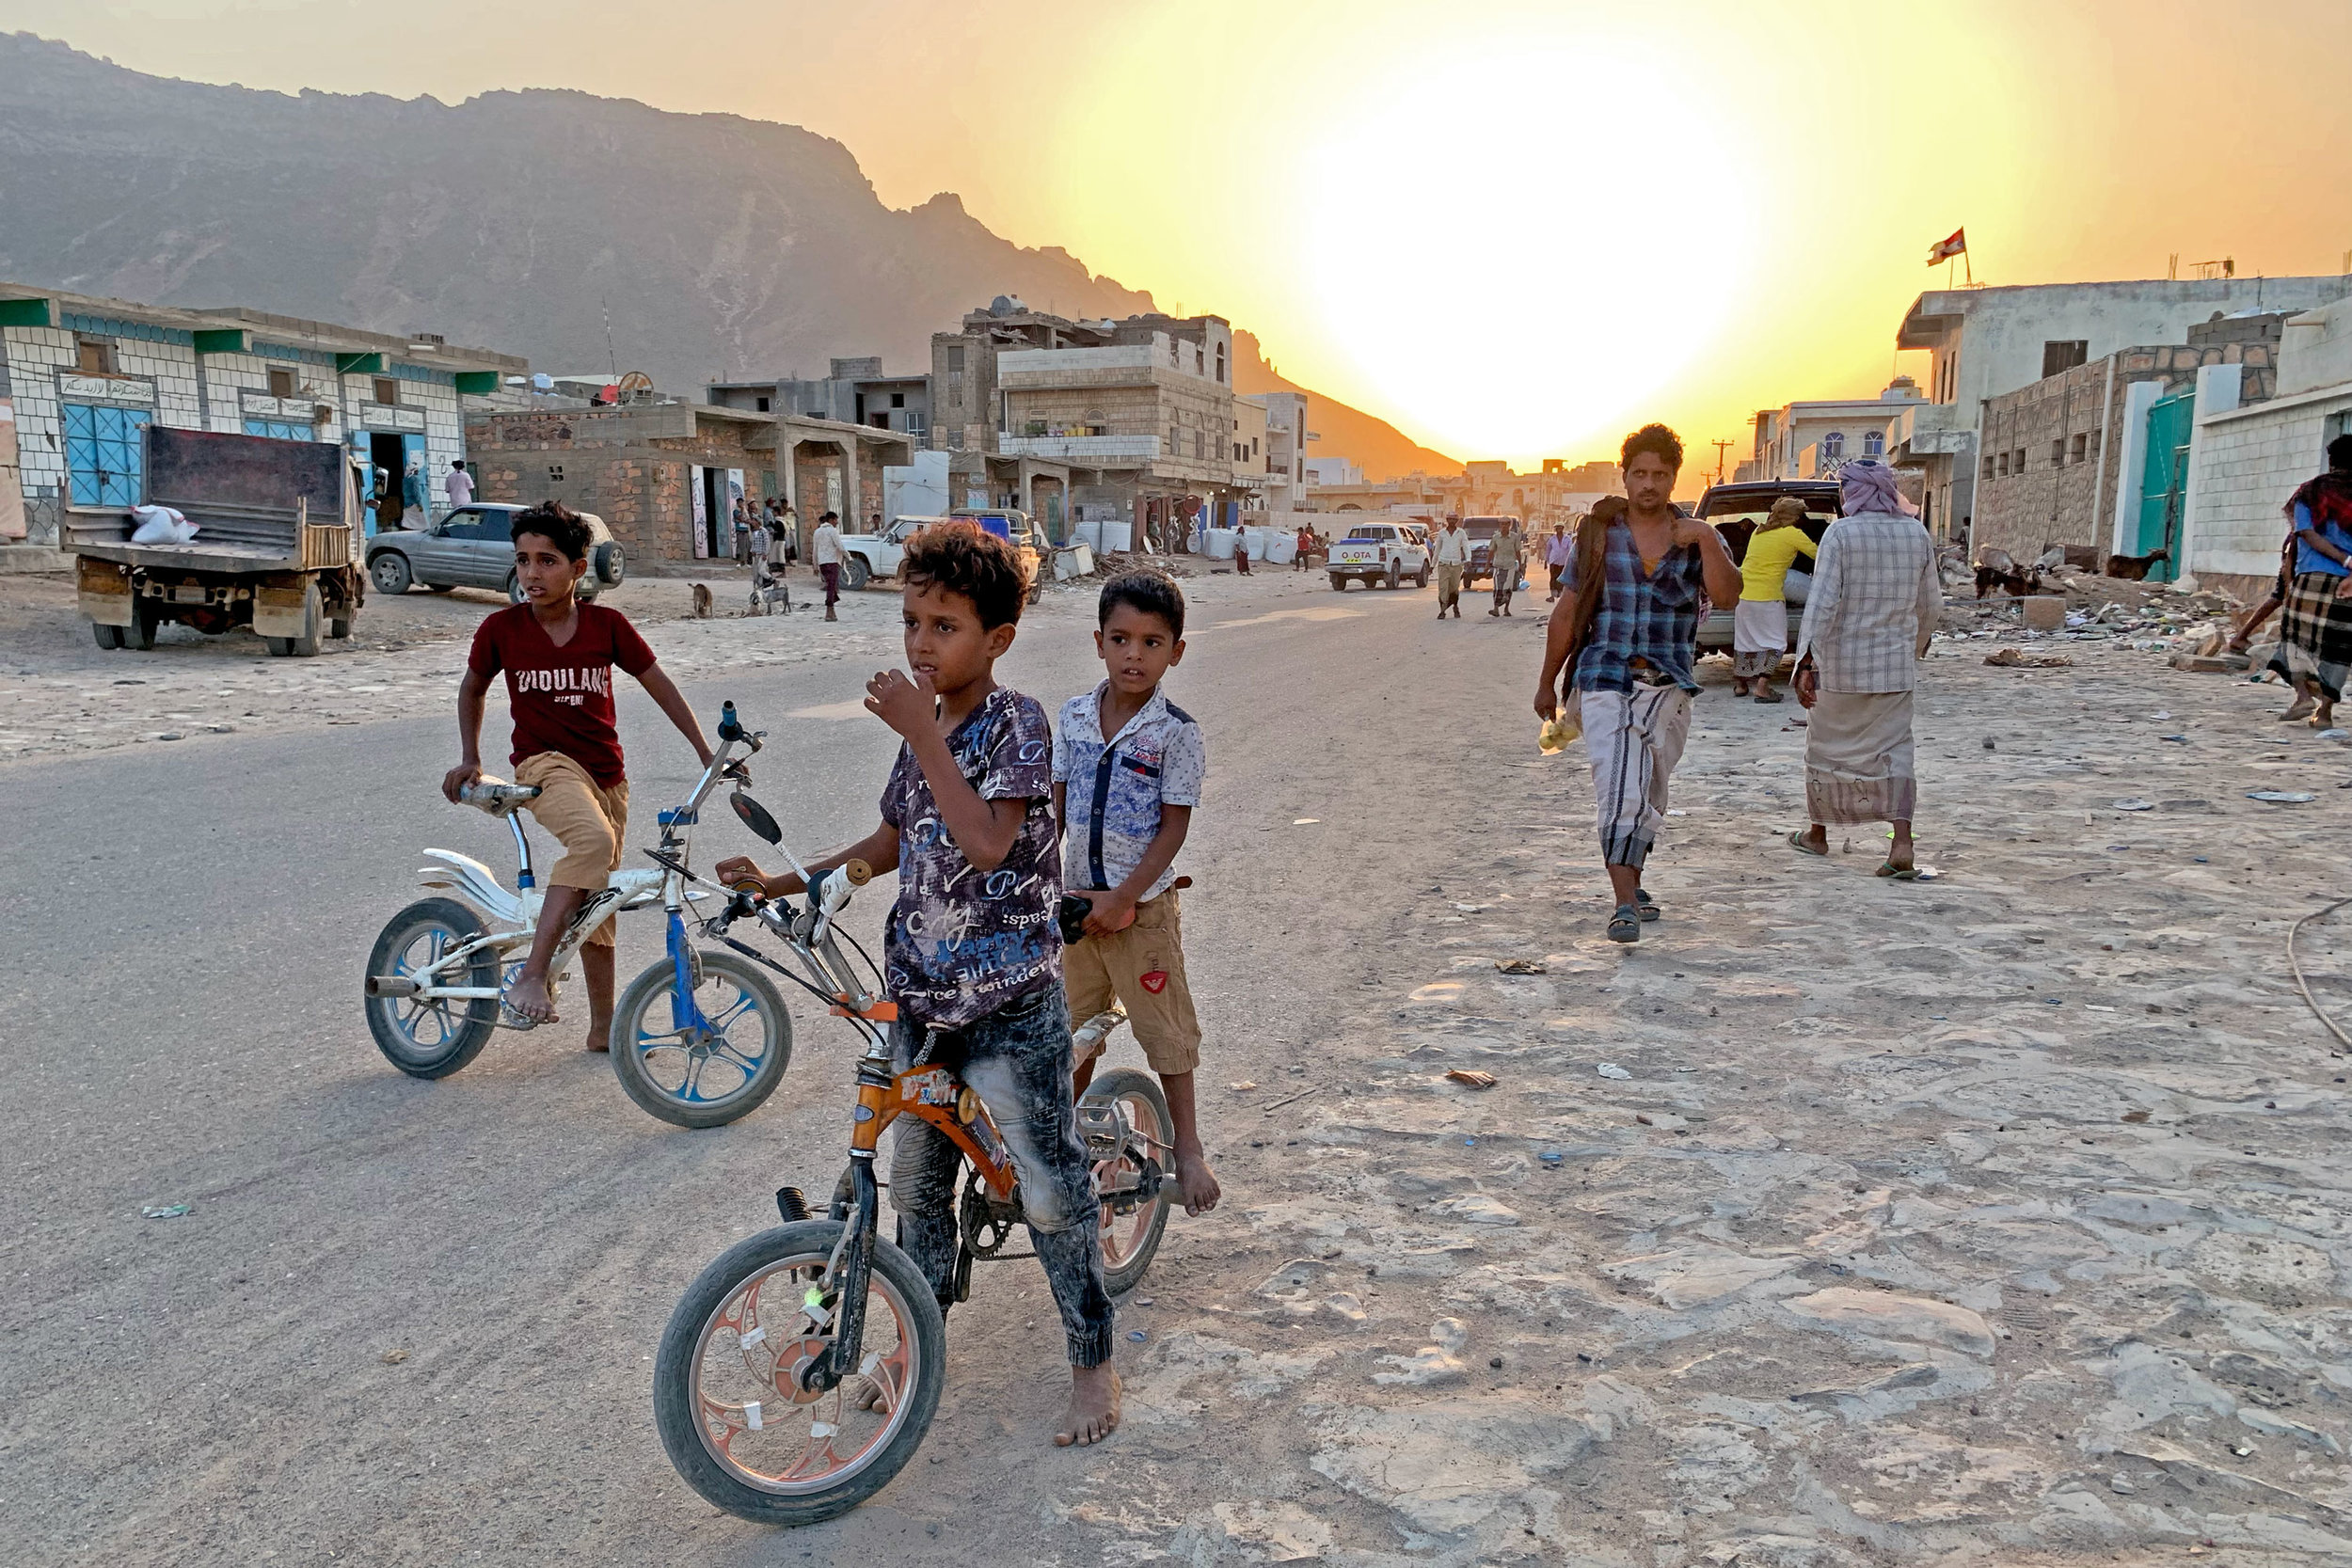 Hadibo street scene